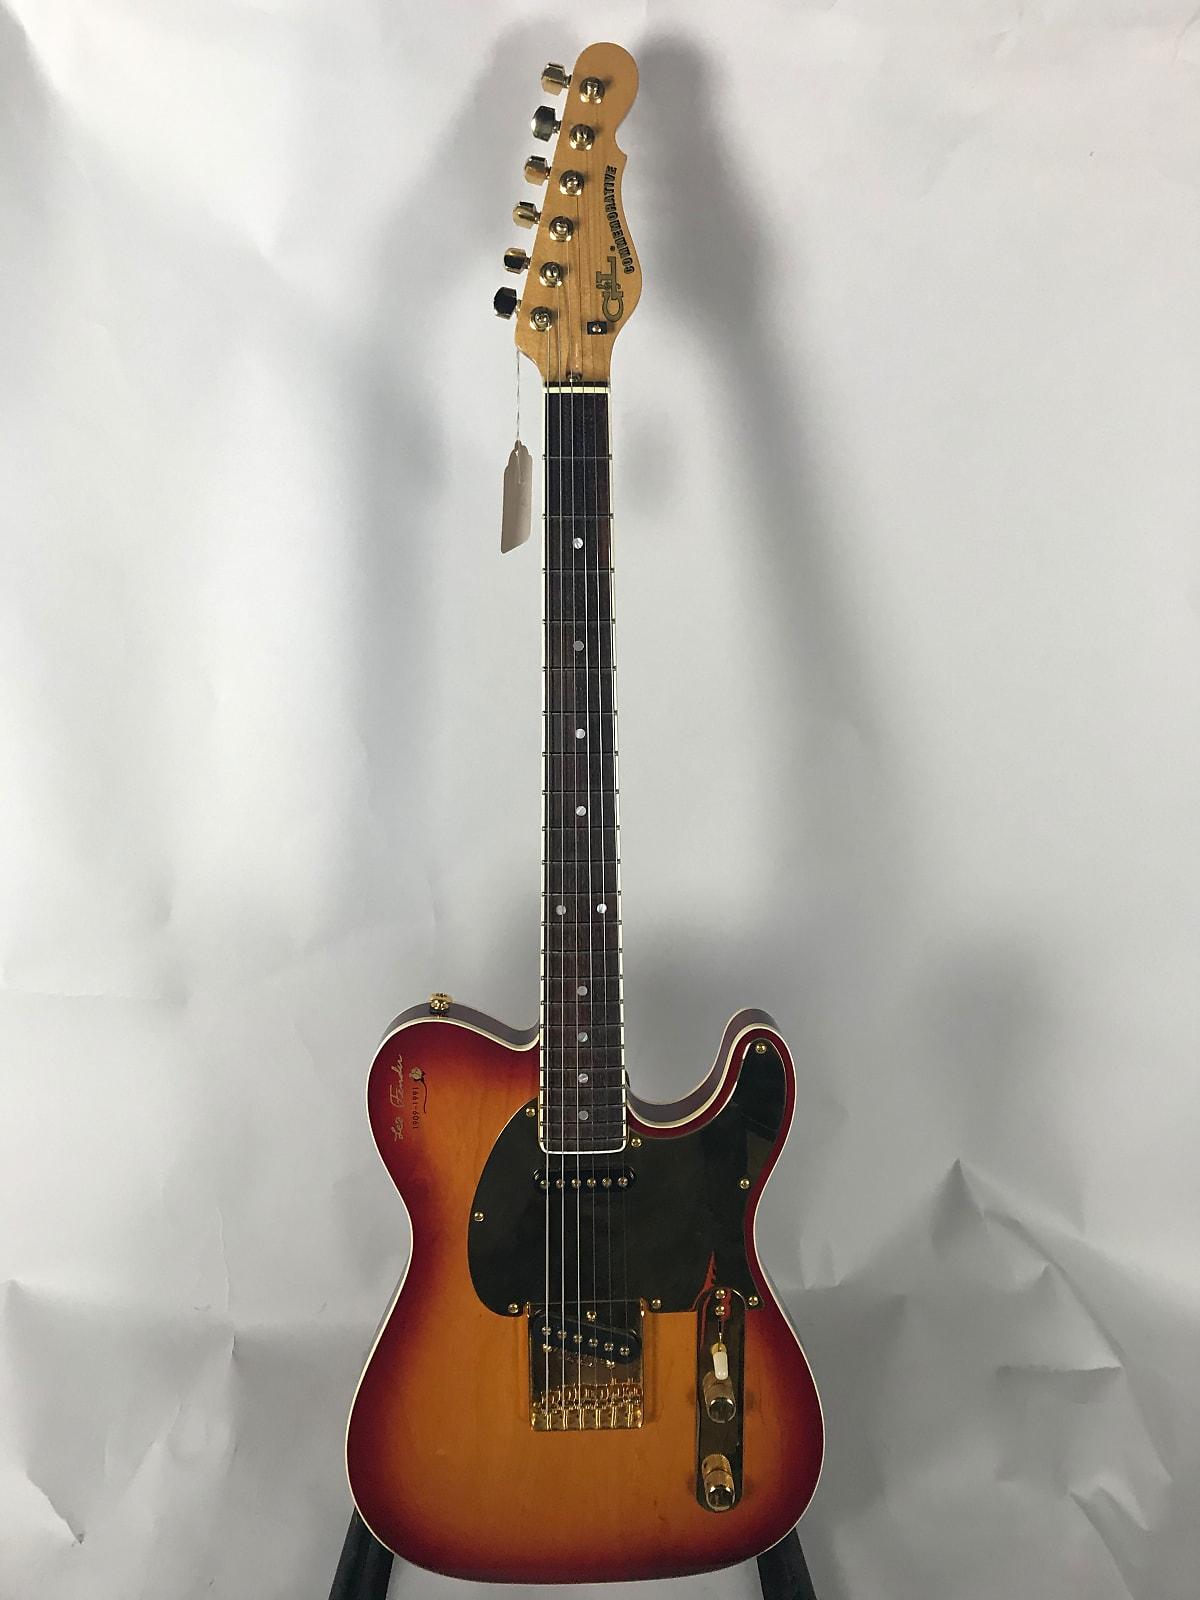 G&L Leo Fender Commemorative #6 of 1000 1991 Cherry Sunburst